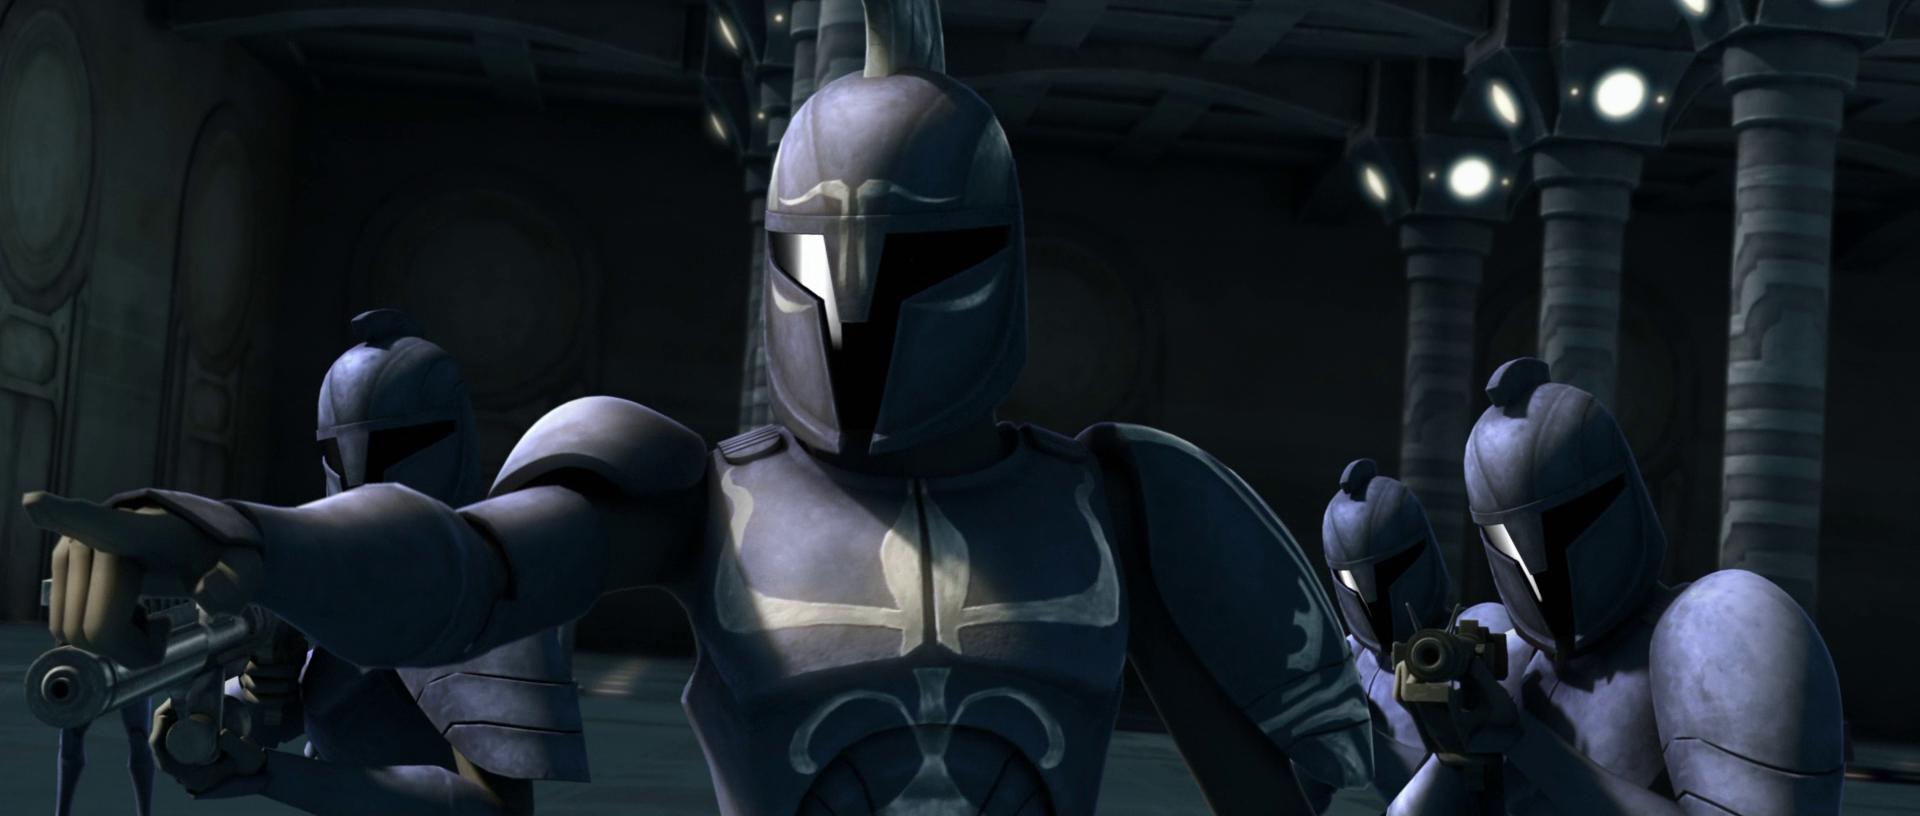 Senate_Commandos.png